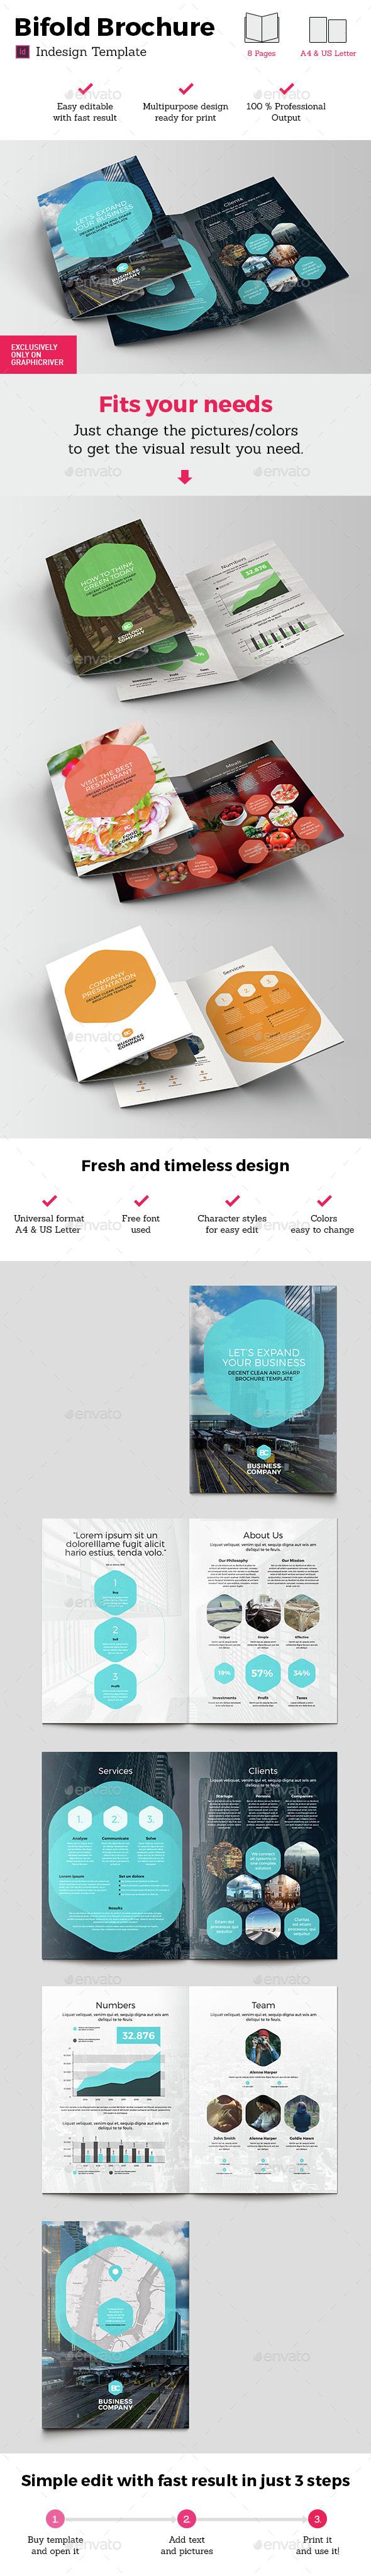 Universal Bifold Brochure Indesign Template - Brochures Print Templates